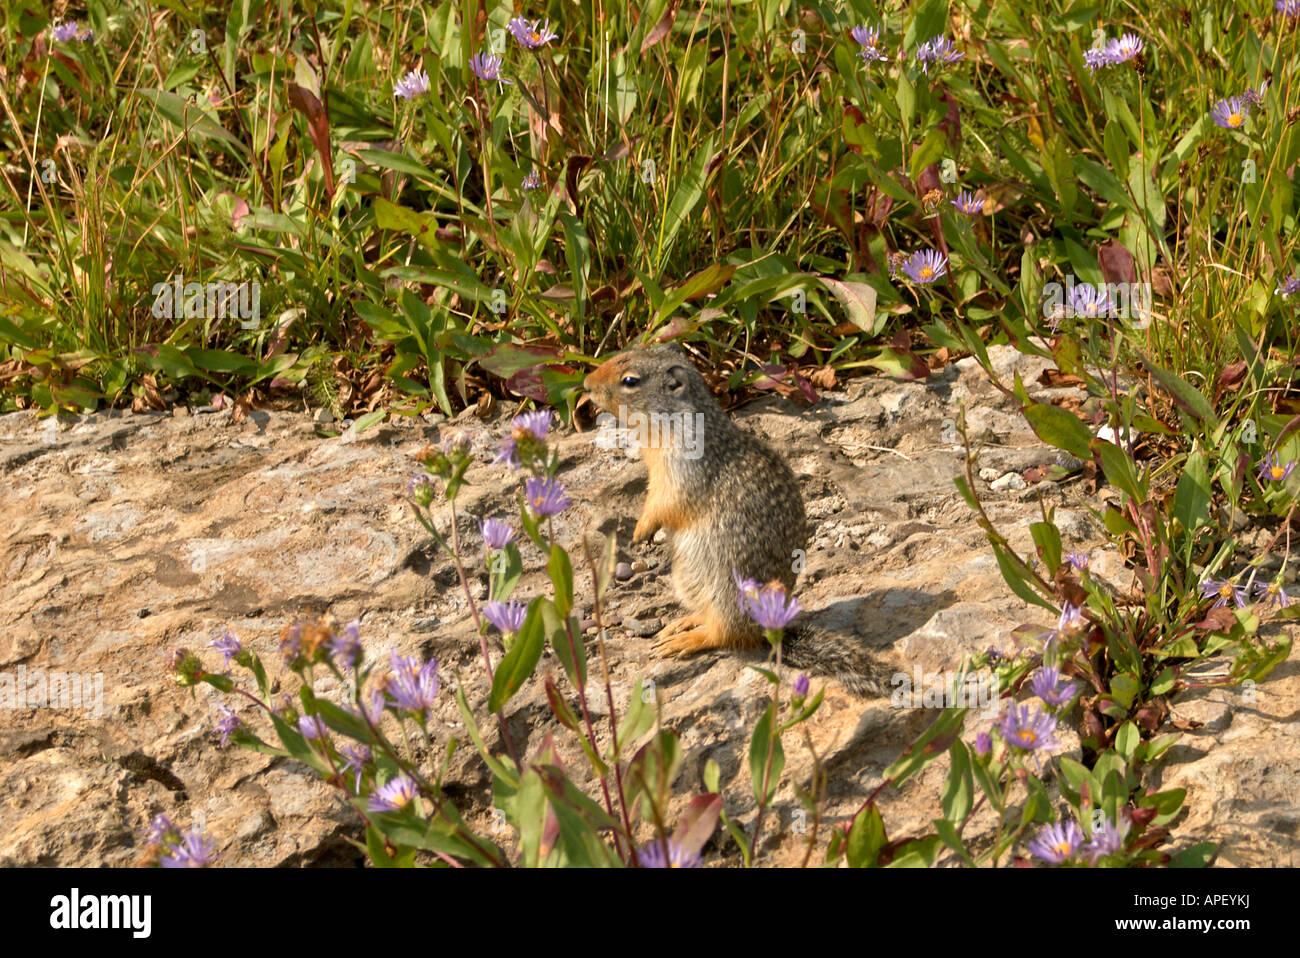 Ground Squirrel spermophilus columbianus and purple aster townsendia parryi Stock Photo